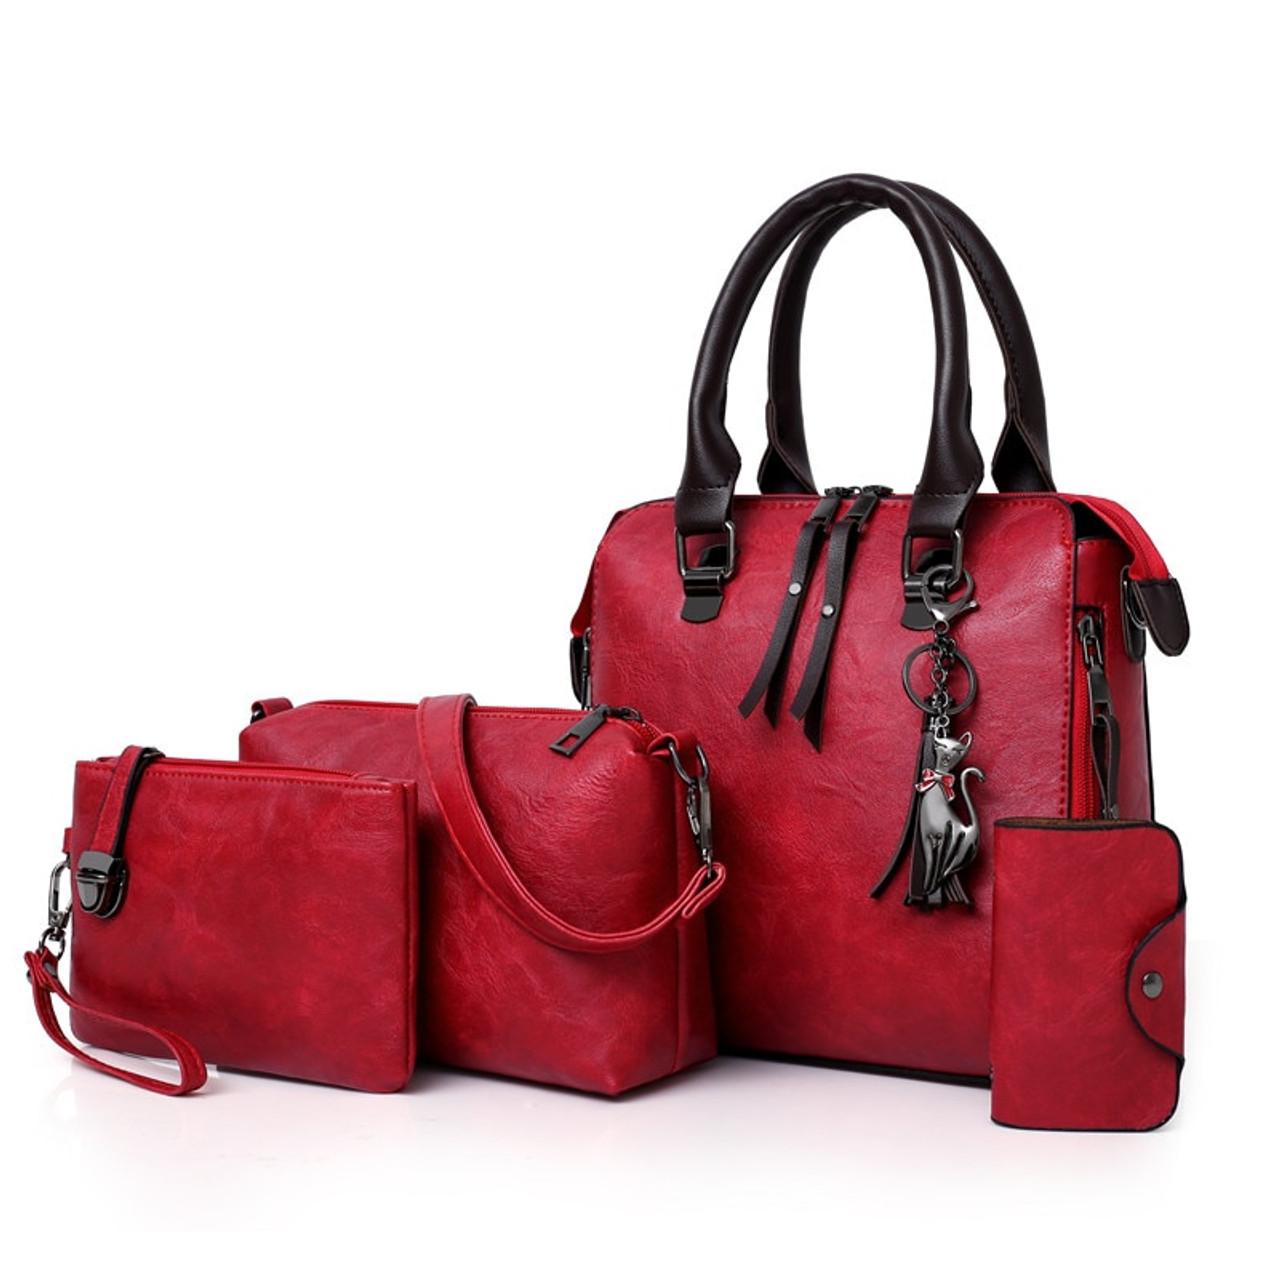 d122165047b1 Four sets wax oil pu leather bag ladies handbags women handbag designer  handbag tasse lhigh quality ...